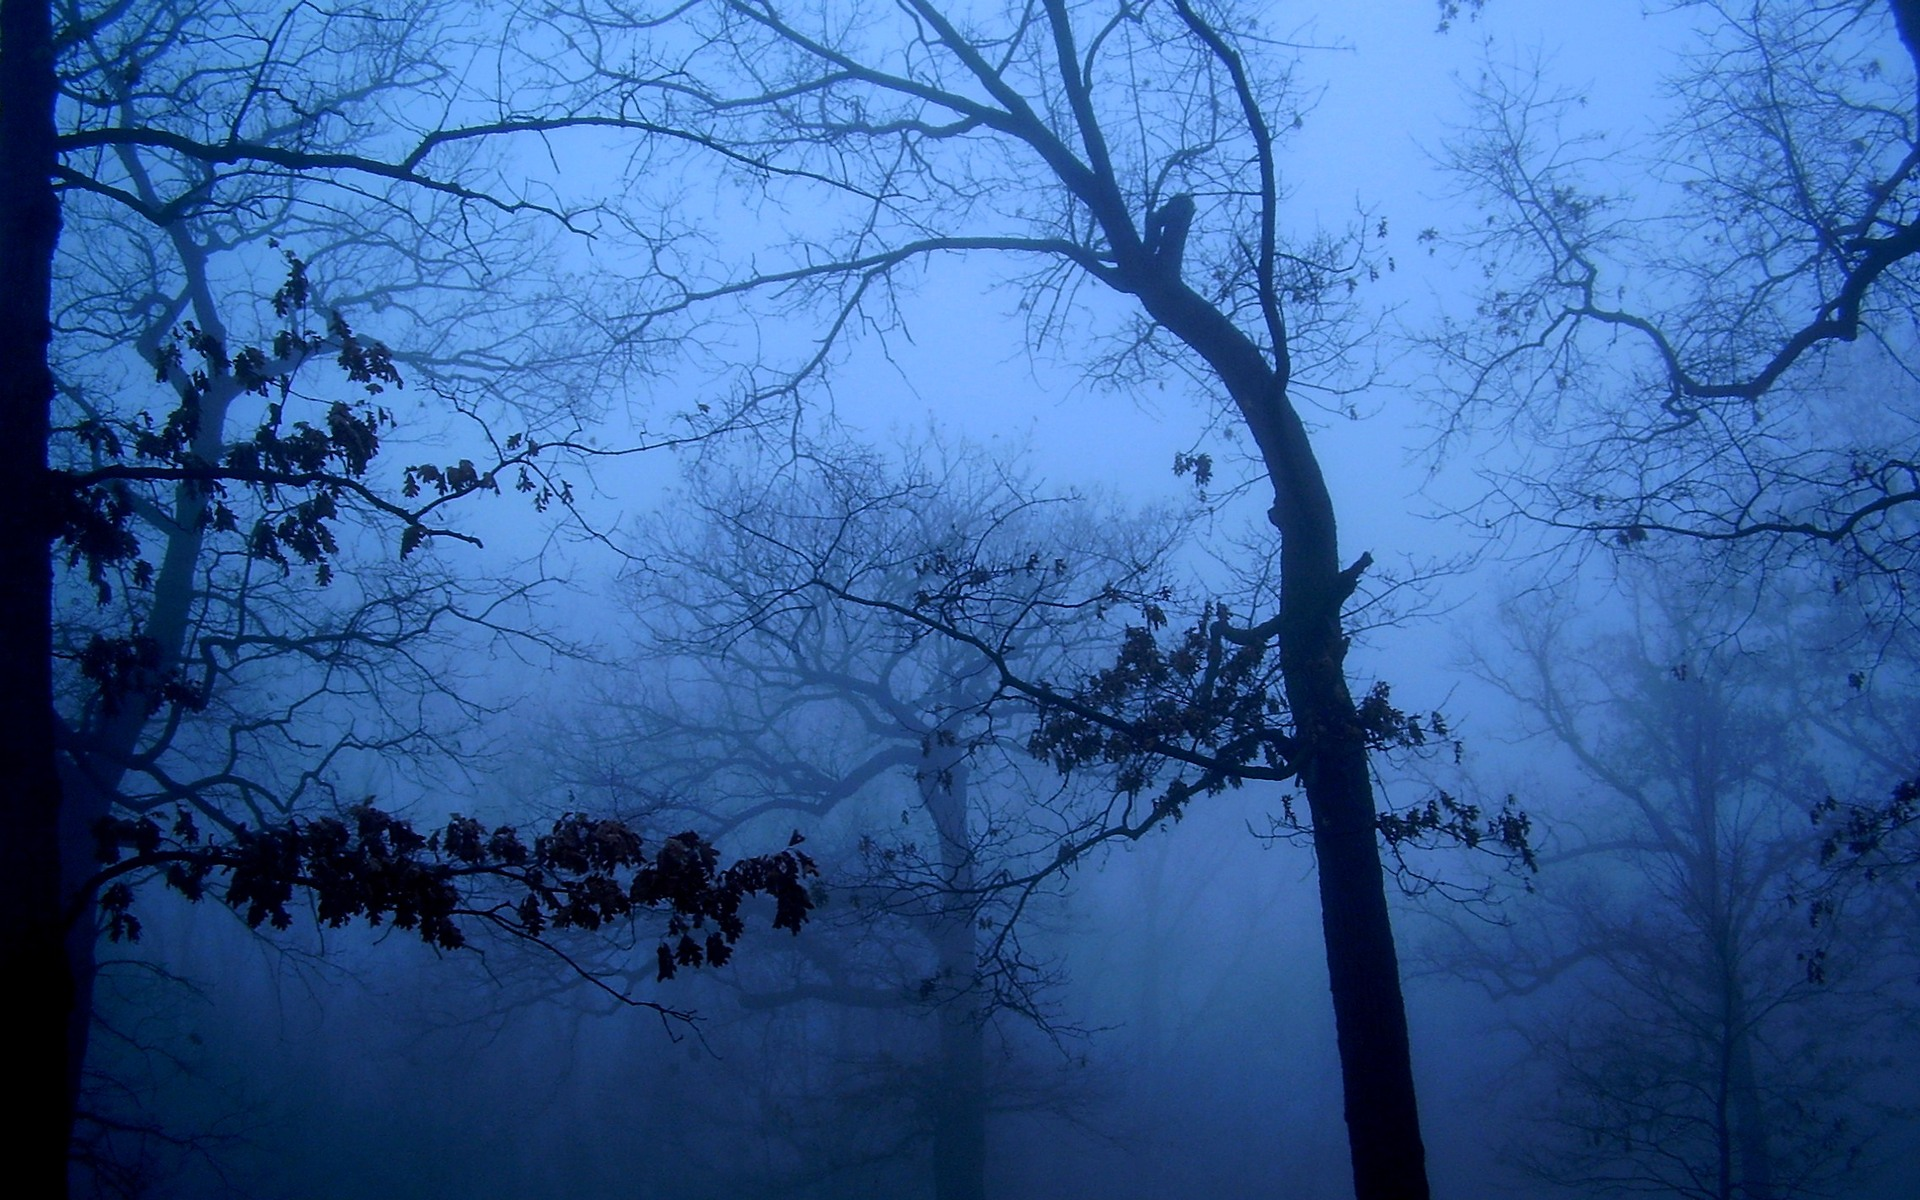 главных туман ночью картинки сарепты объединяет дома